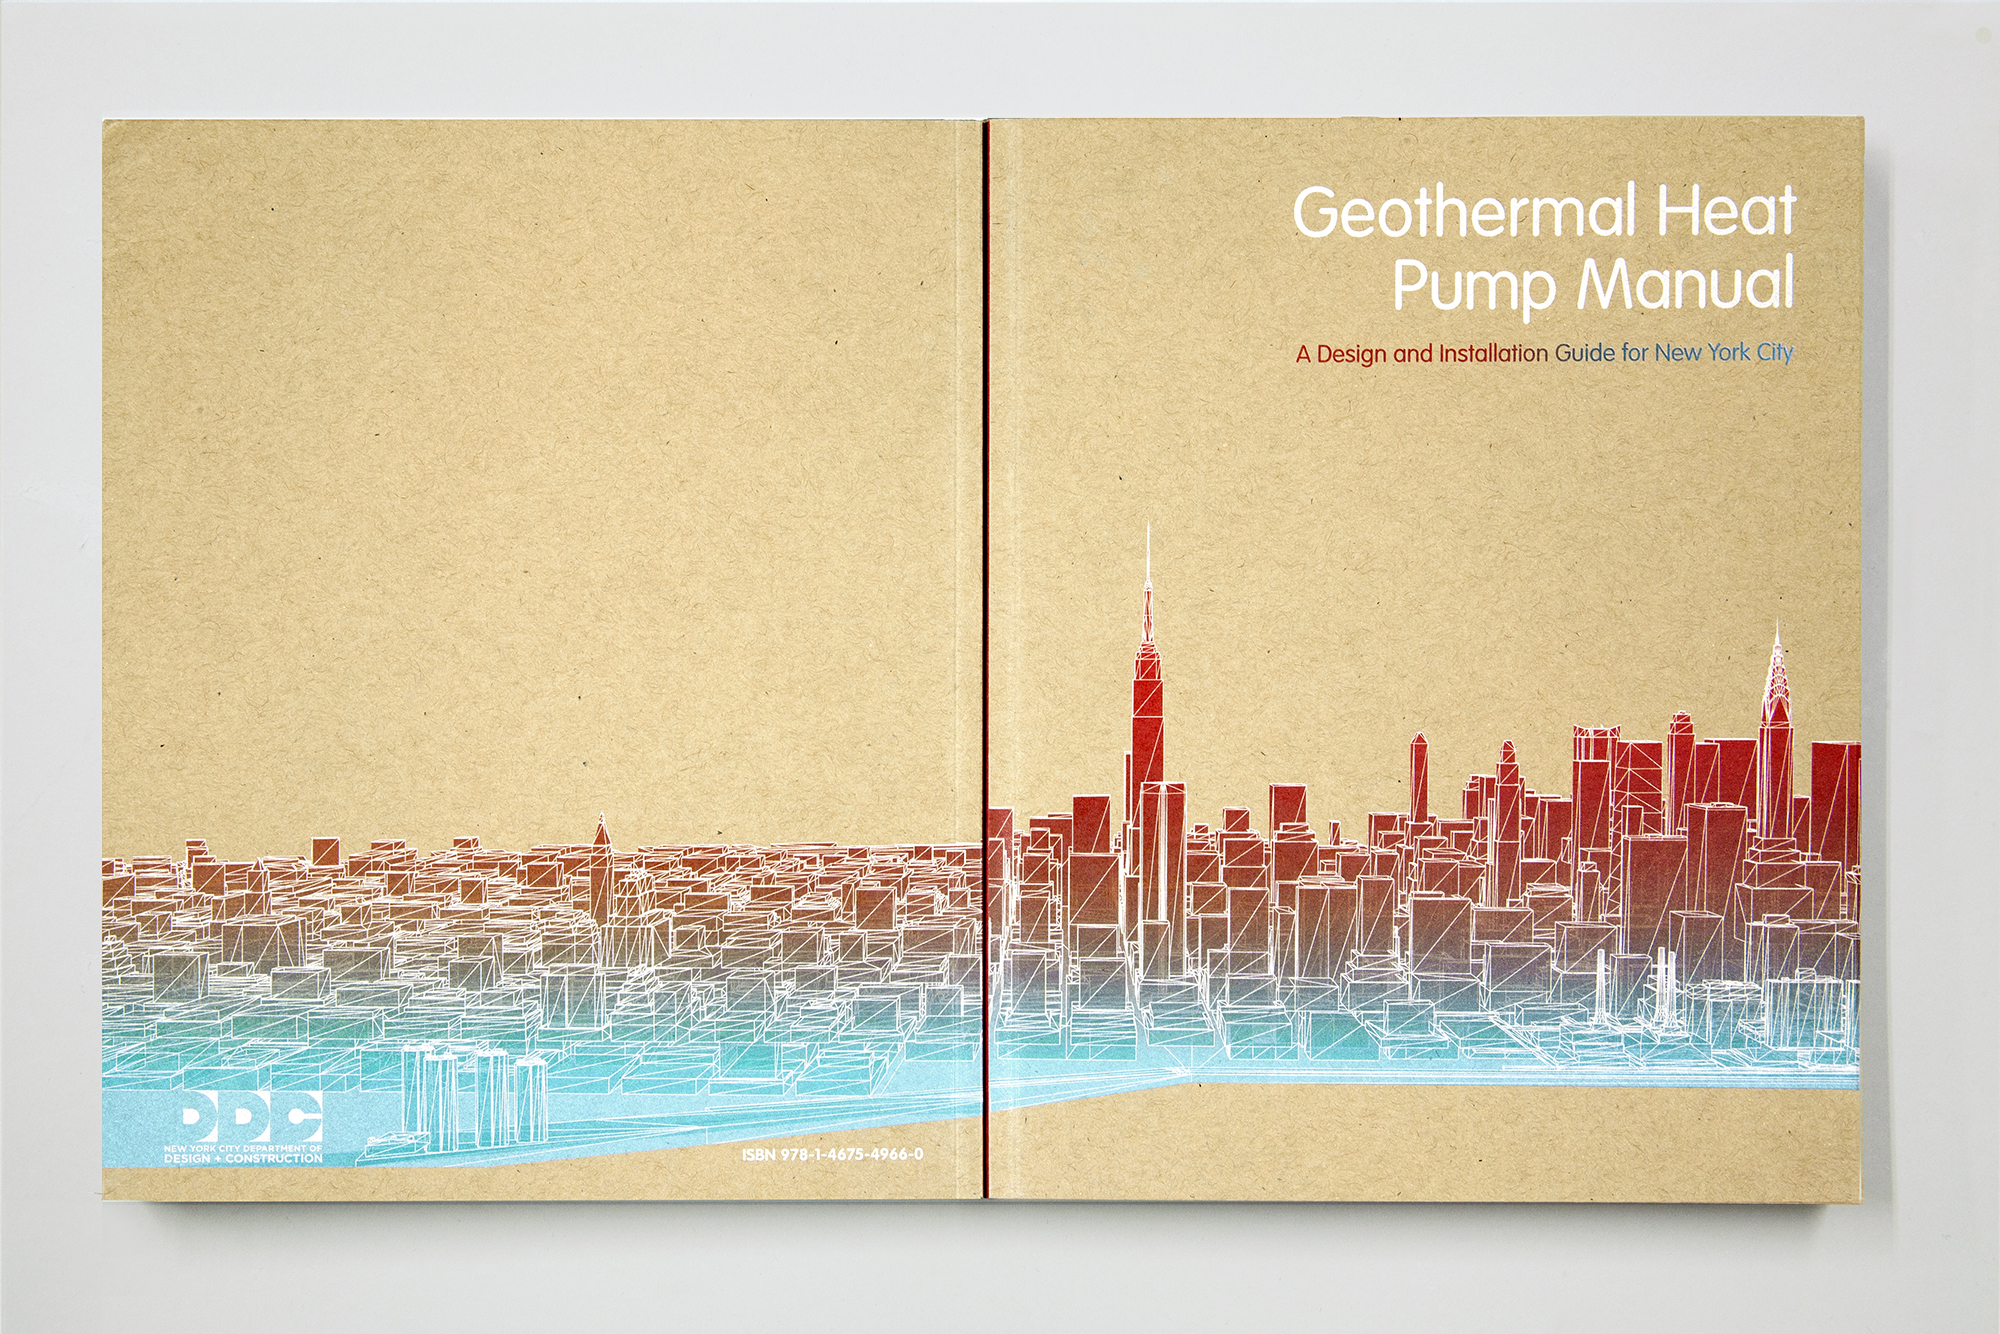 Cover image: DDC Geothermal Heat Pump Manual